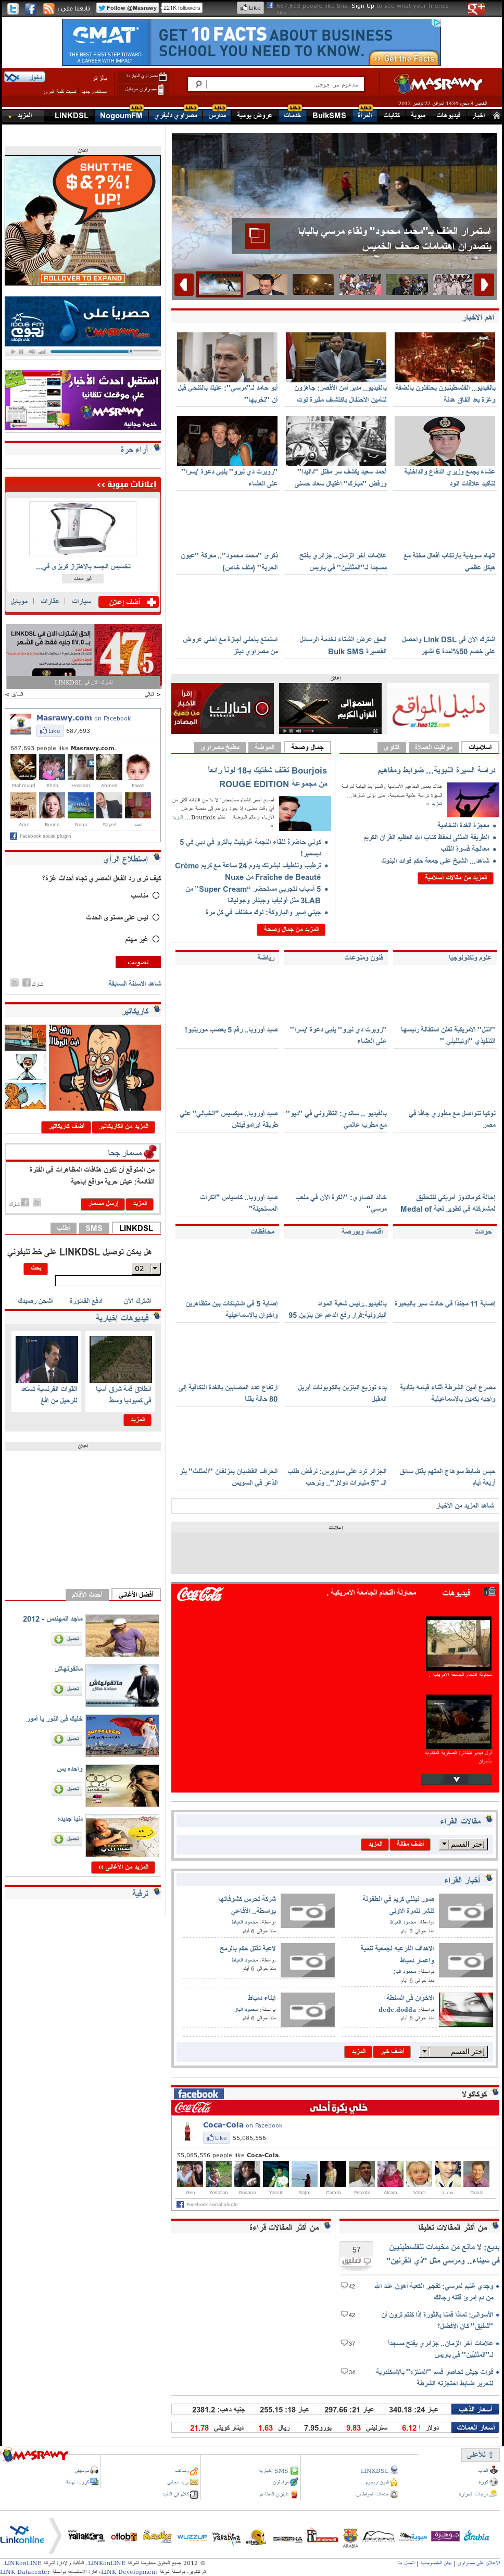 Masrawy at Thursday Nov. 22, 2012, 8:21 a.m. UTC